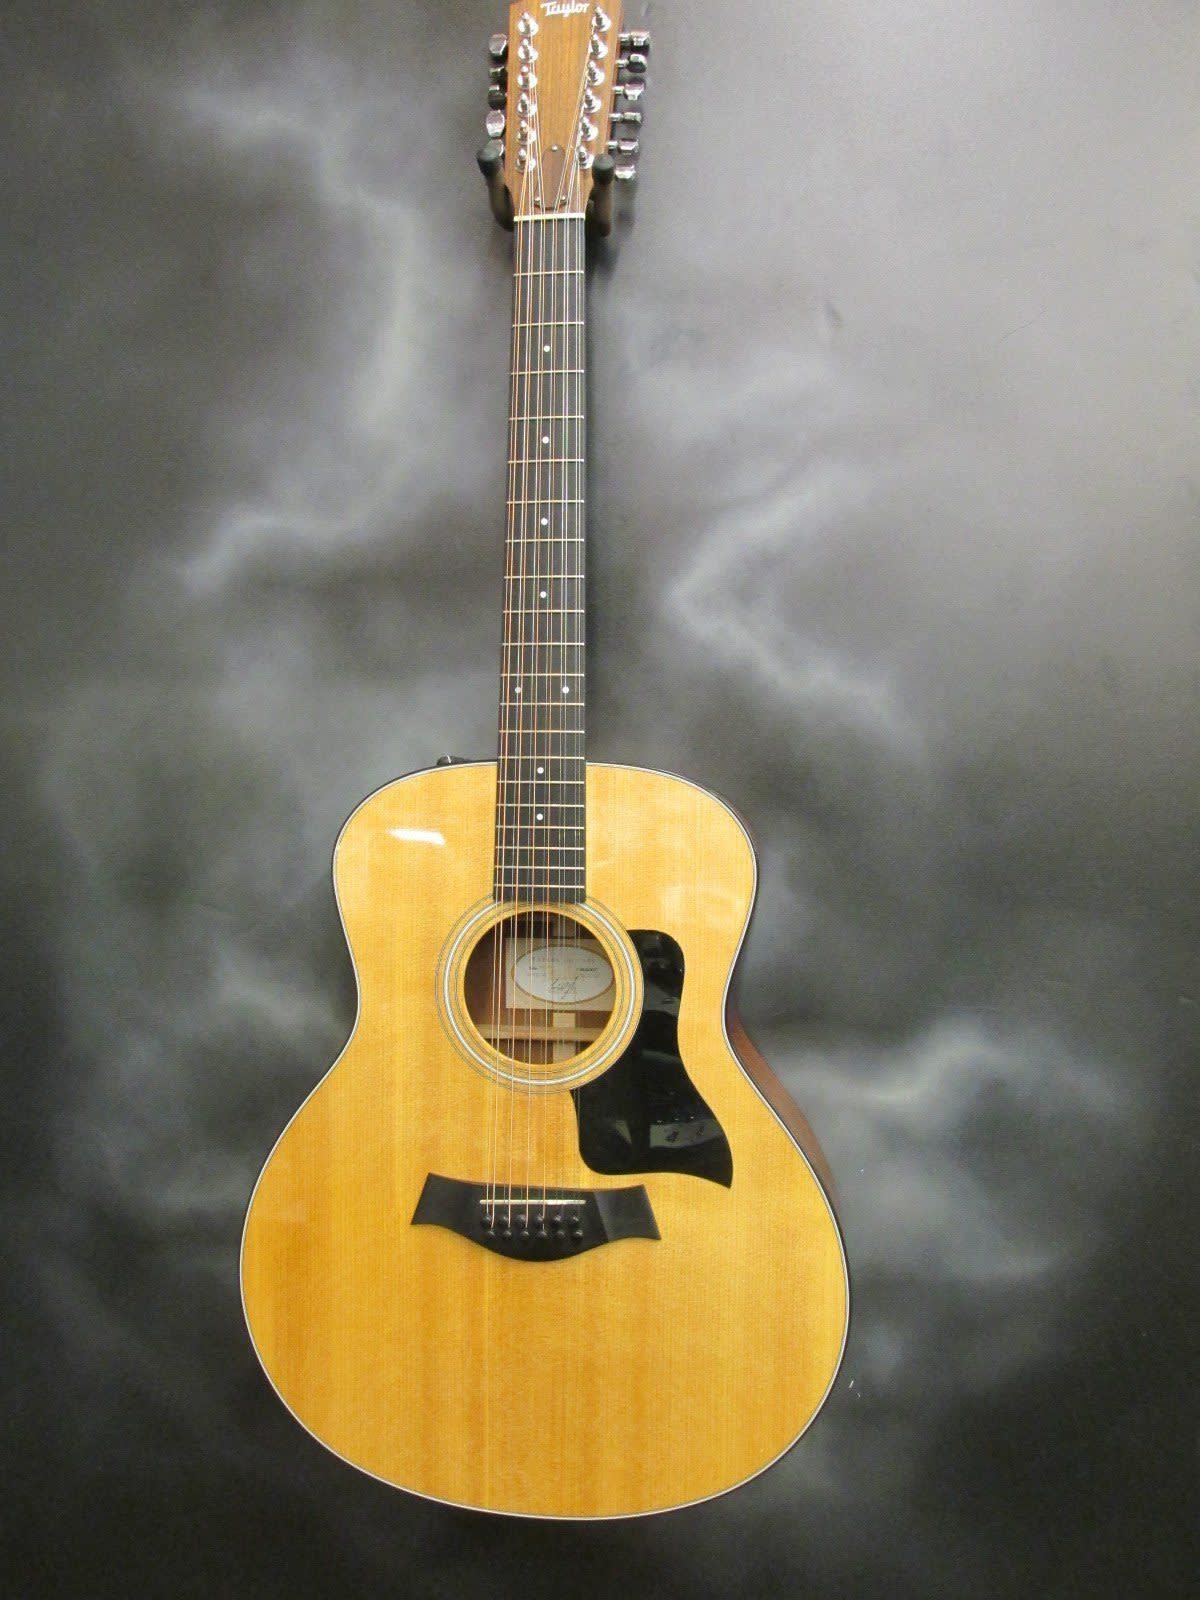 taylor 356e 12 string acoustic electric guitar reverb. Black Bedroom Furniture Sets. Home Design Ideas